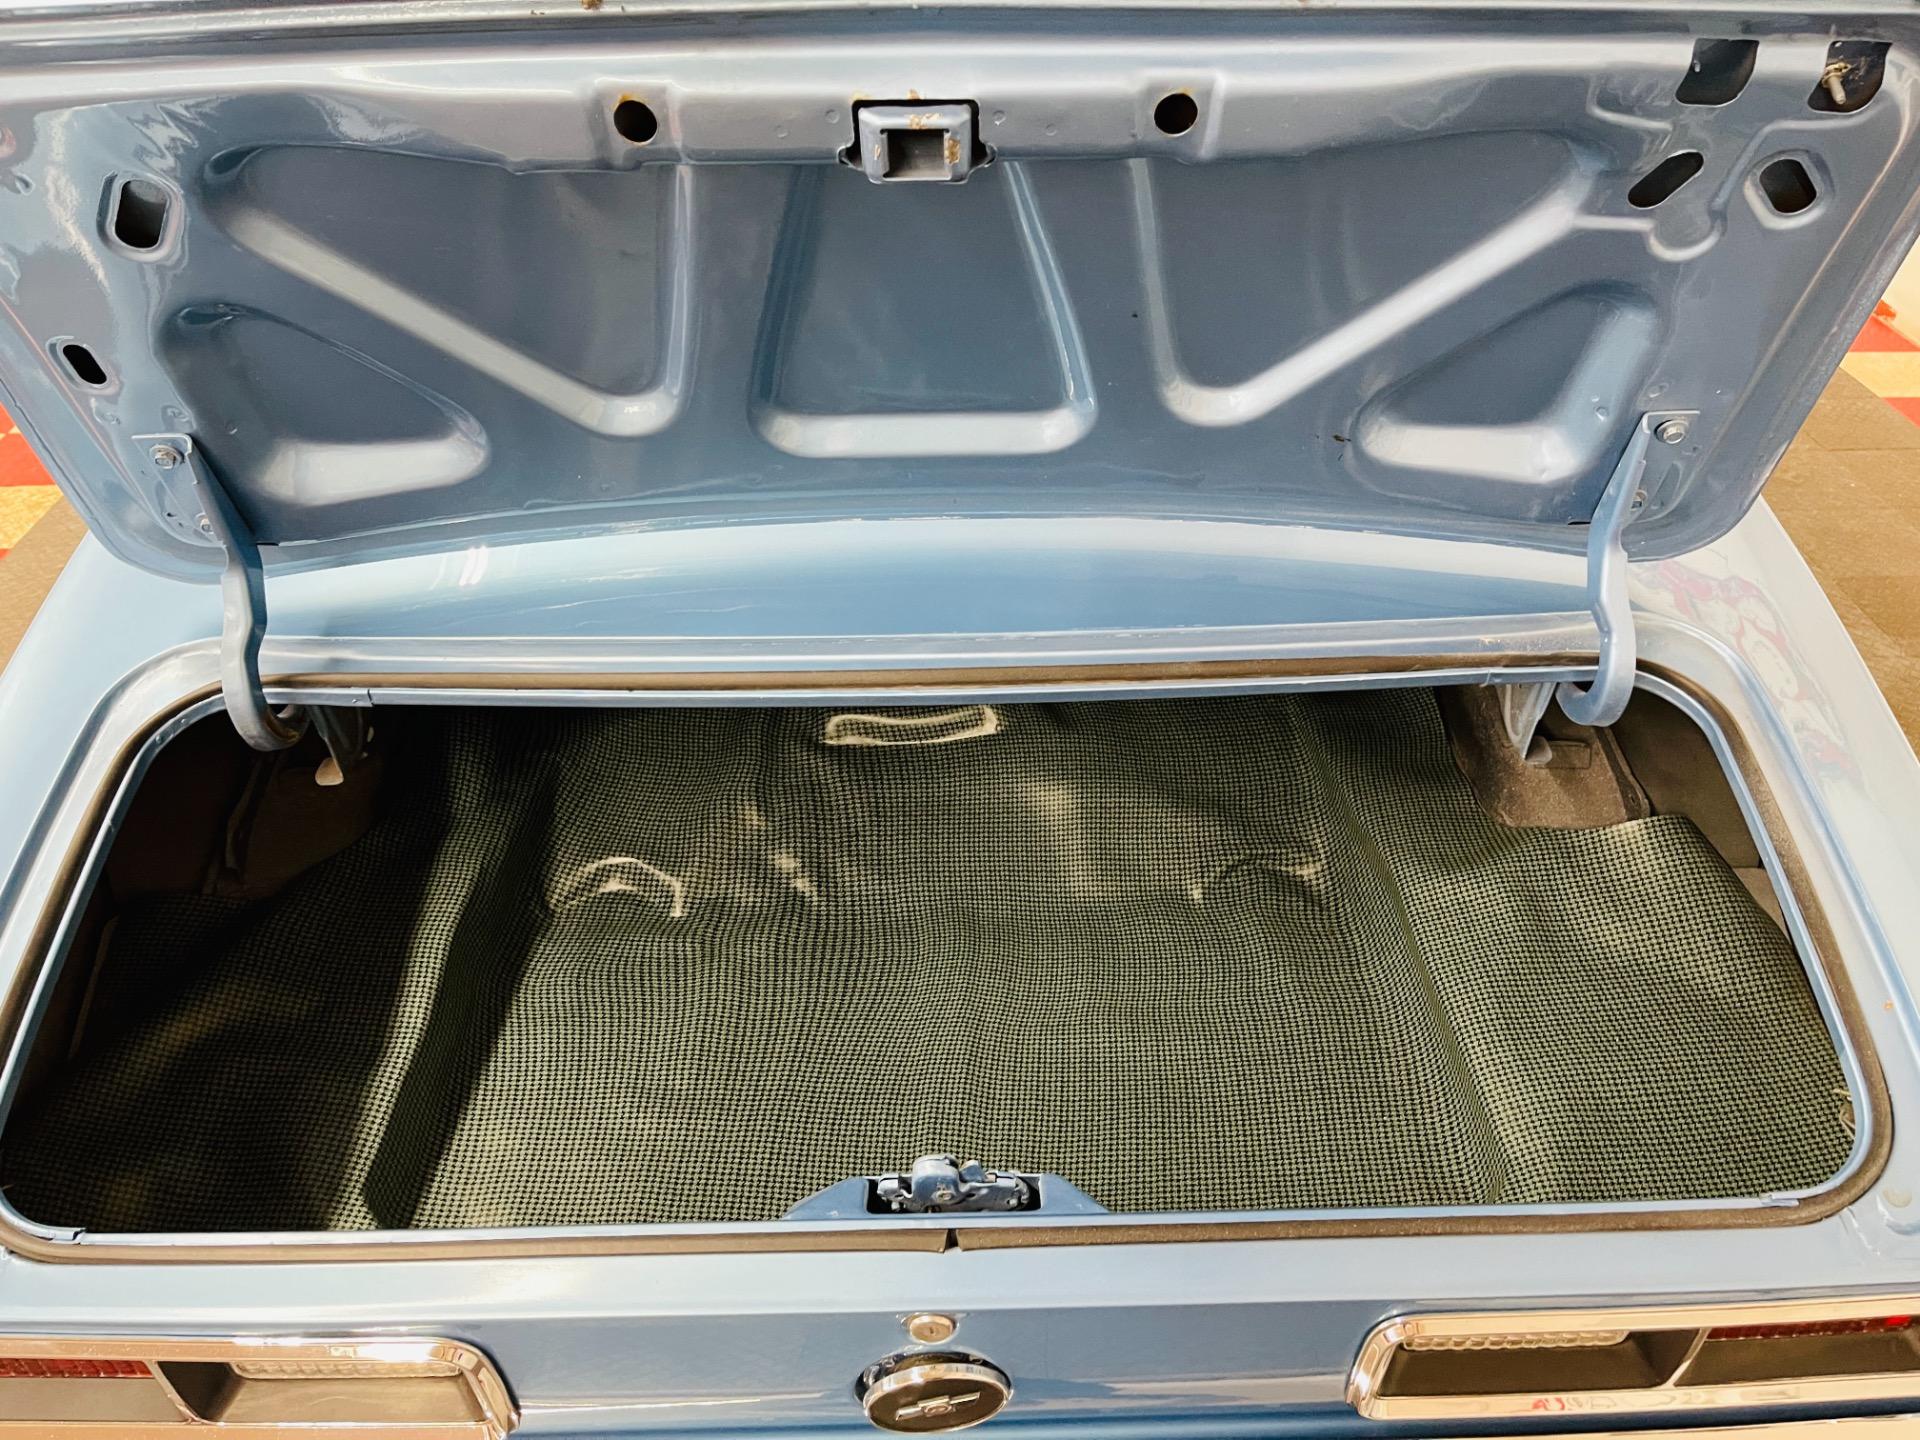 Used 1968 Chevrolet Camaro - 327 ENGINE - GROTTO BLUE - SEE VIDEO - | Mundelein, IL